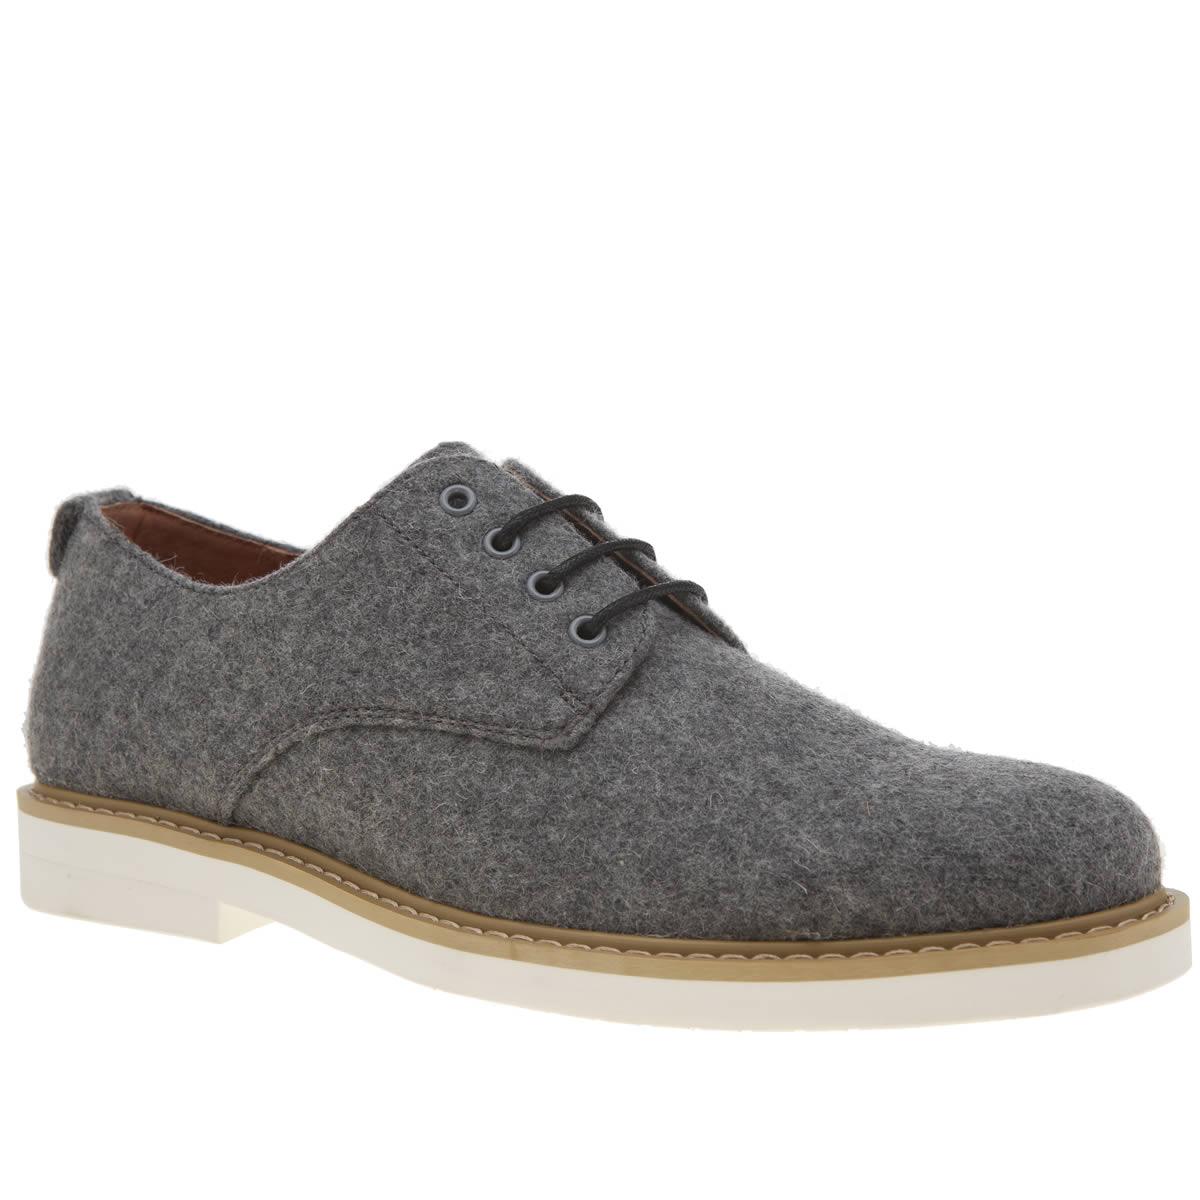 Peter Werth Peter Werth Light Grey Melton Derby Shoes